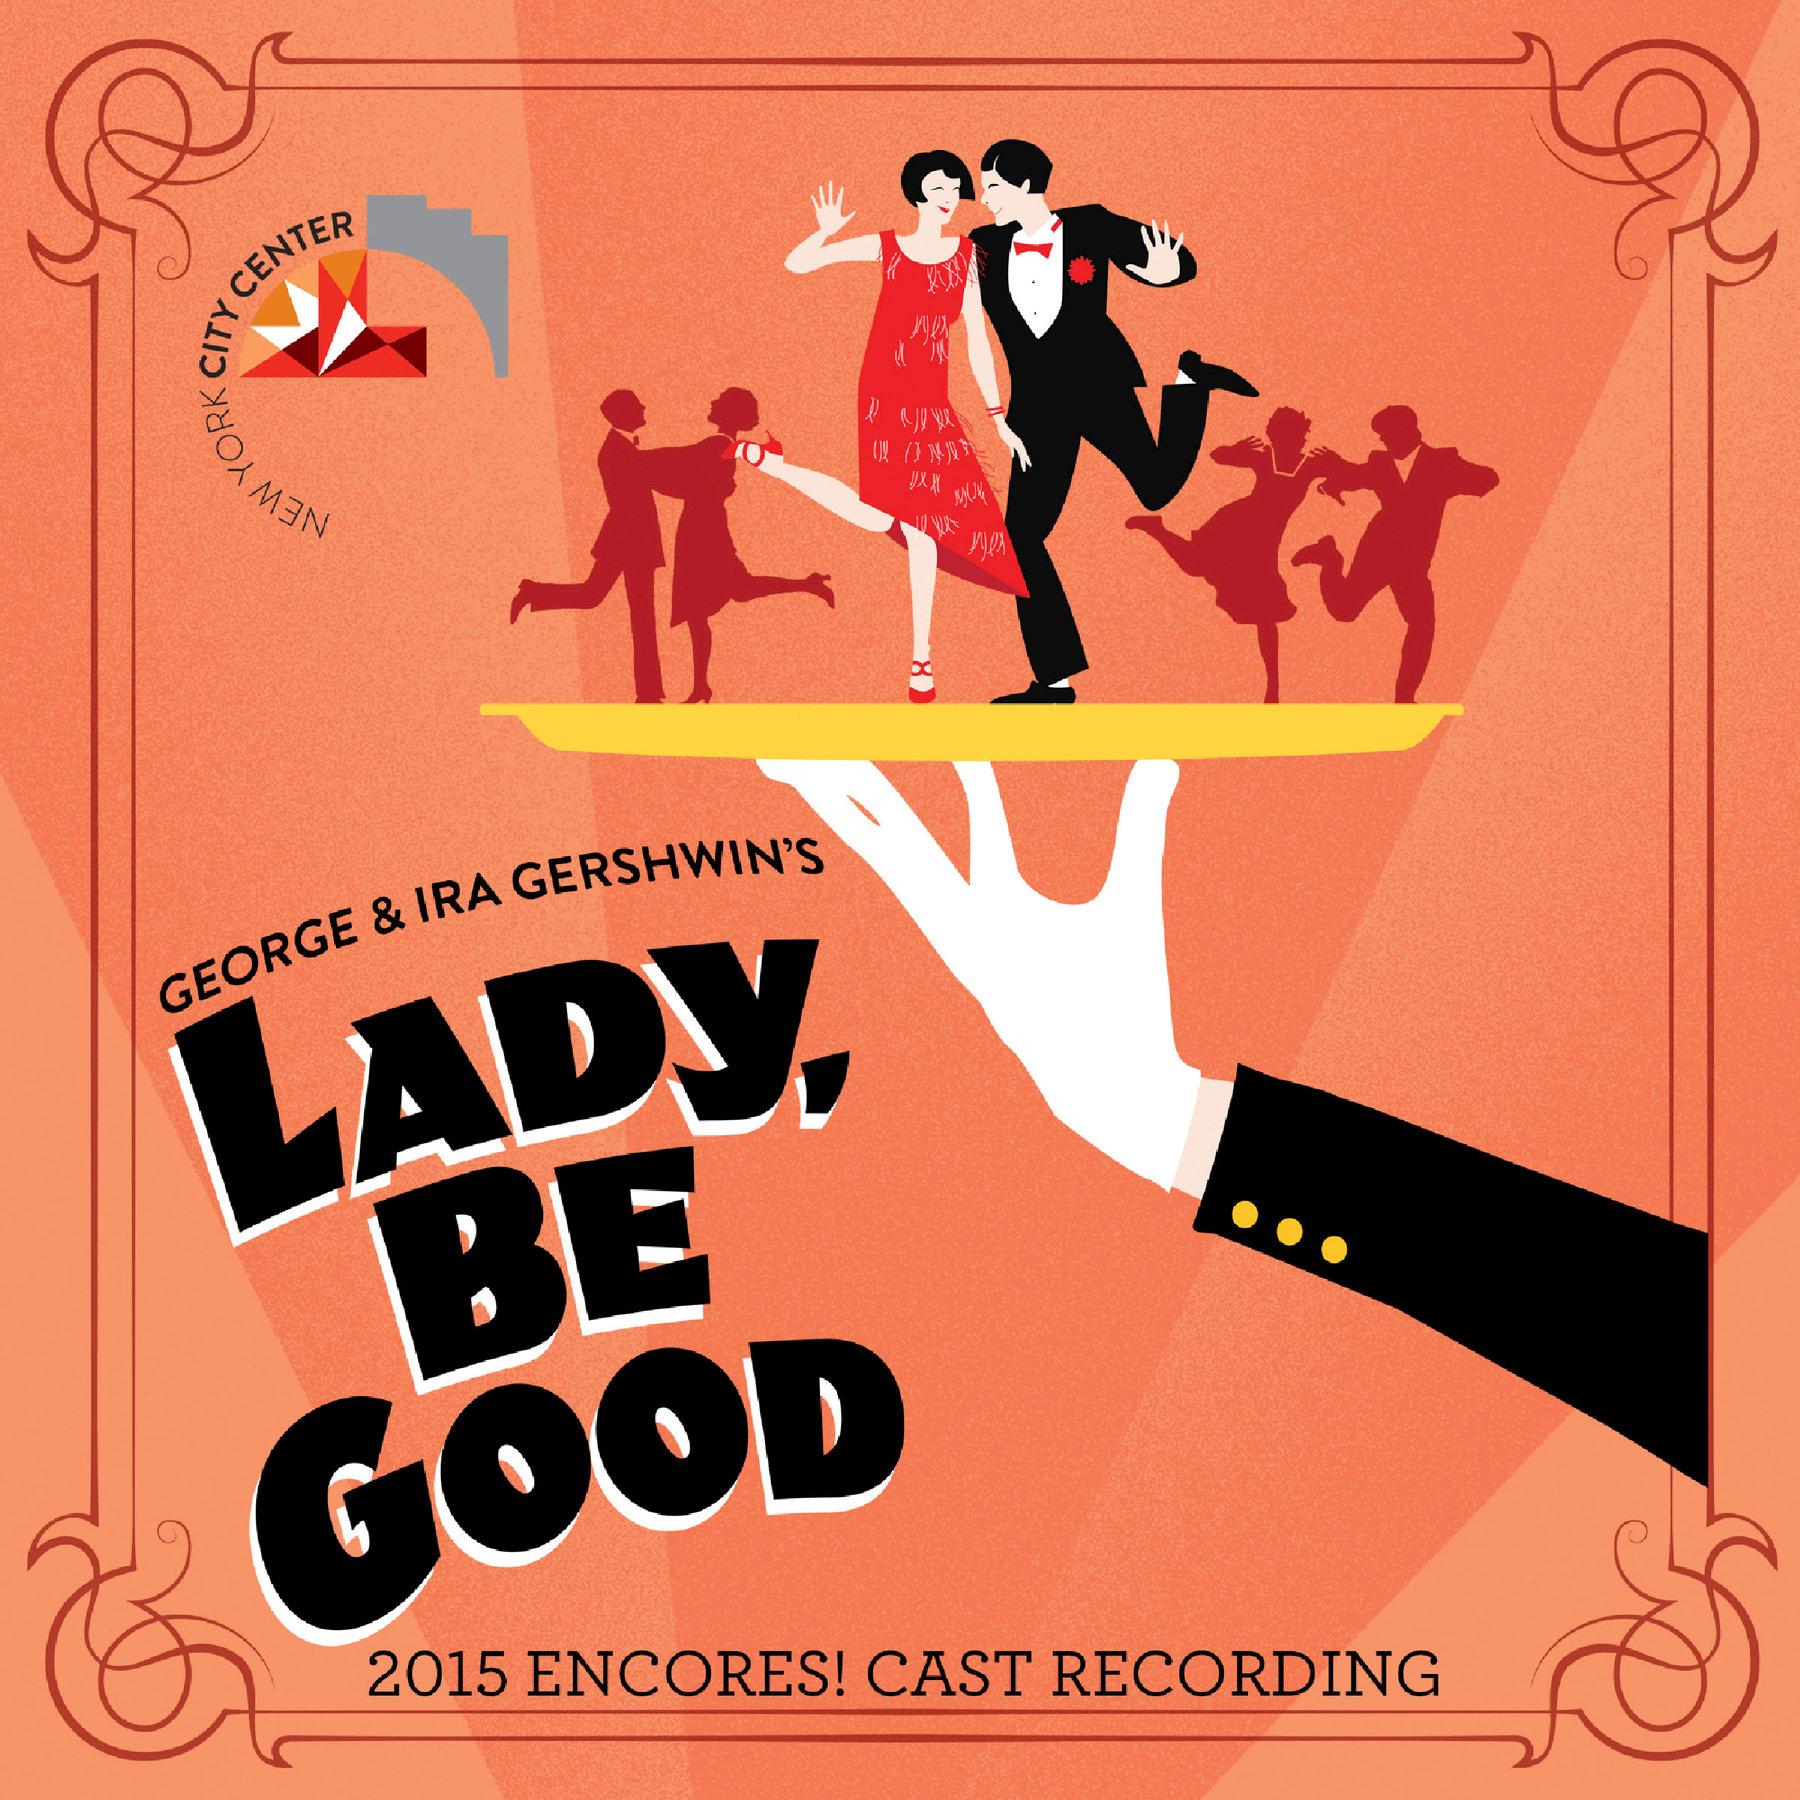 Lady, Be Good! 2015 Encores! Cast Recording